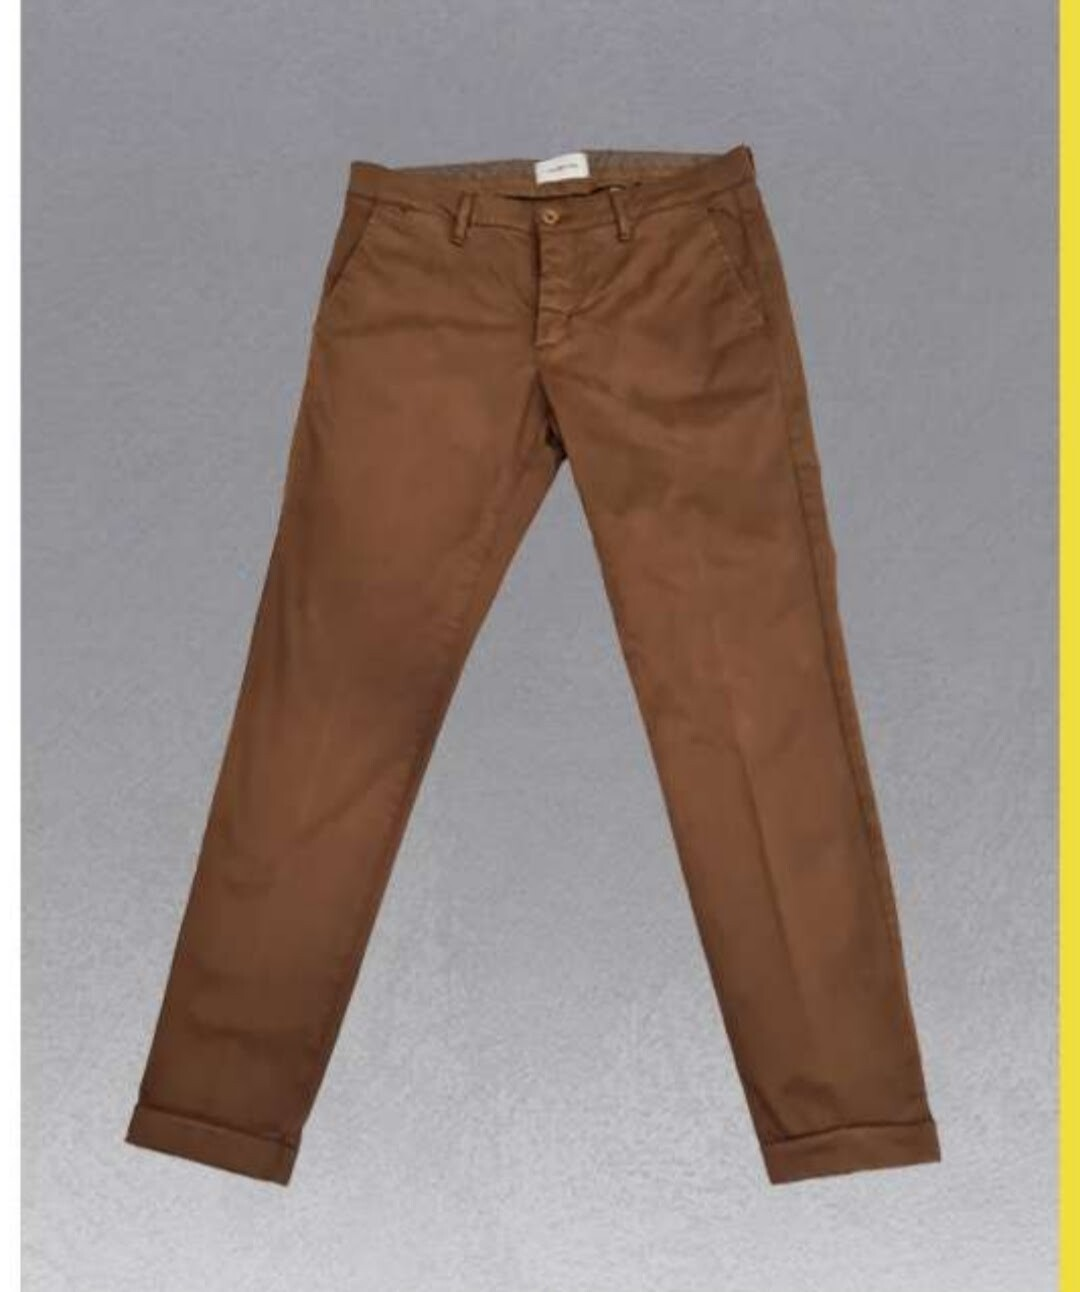 Pantalone chino armaturato